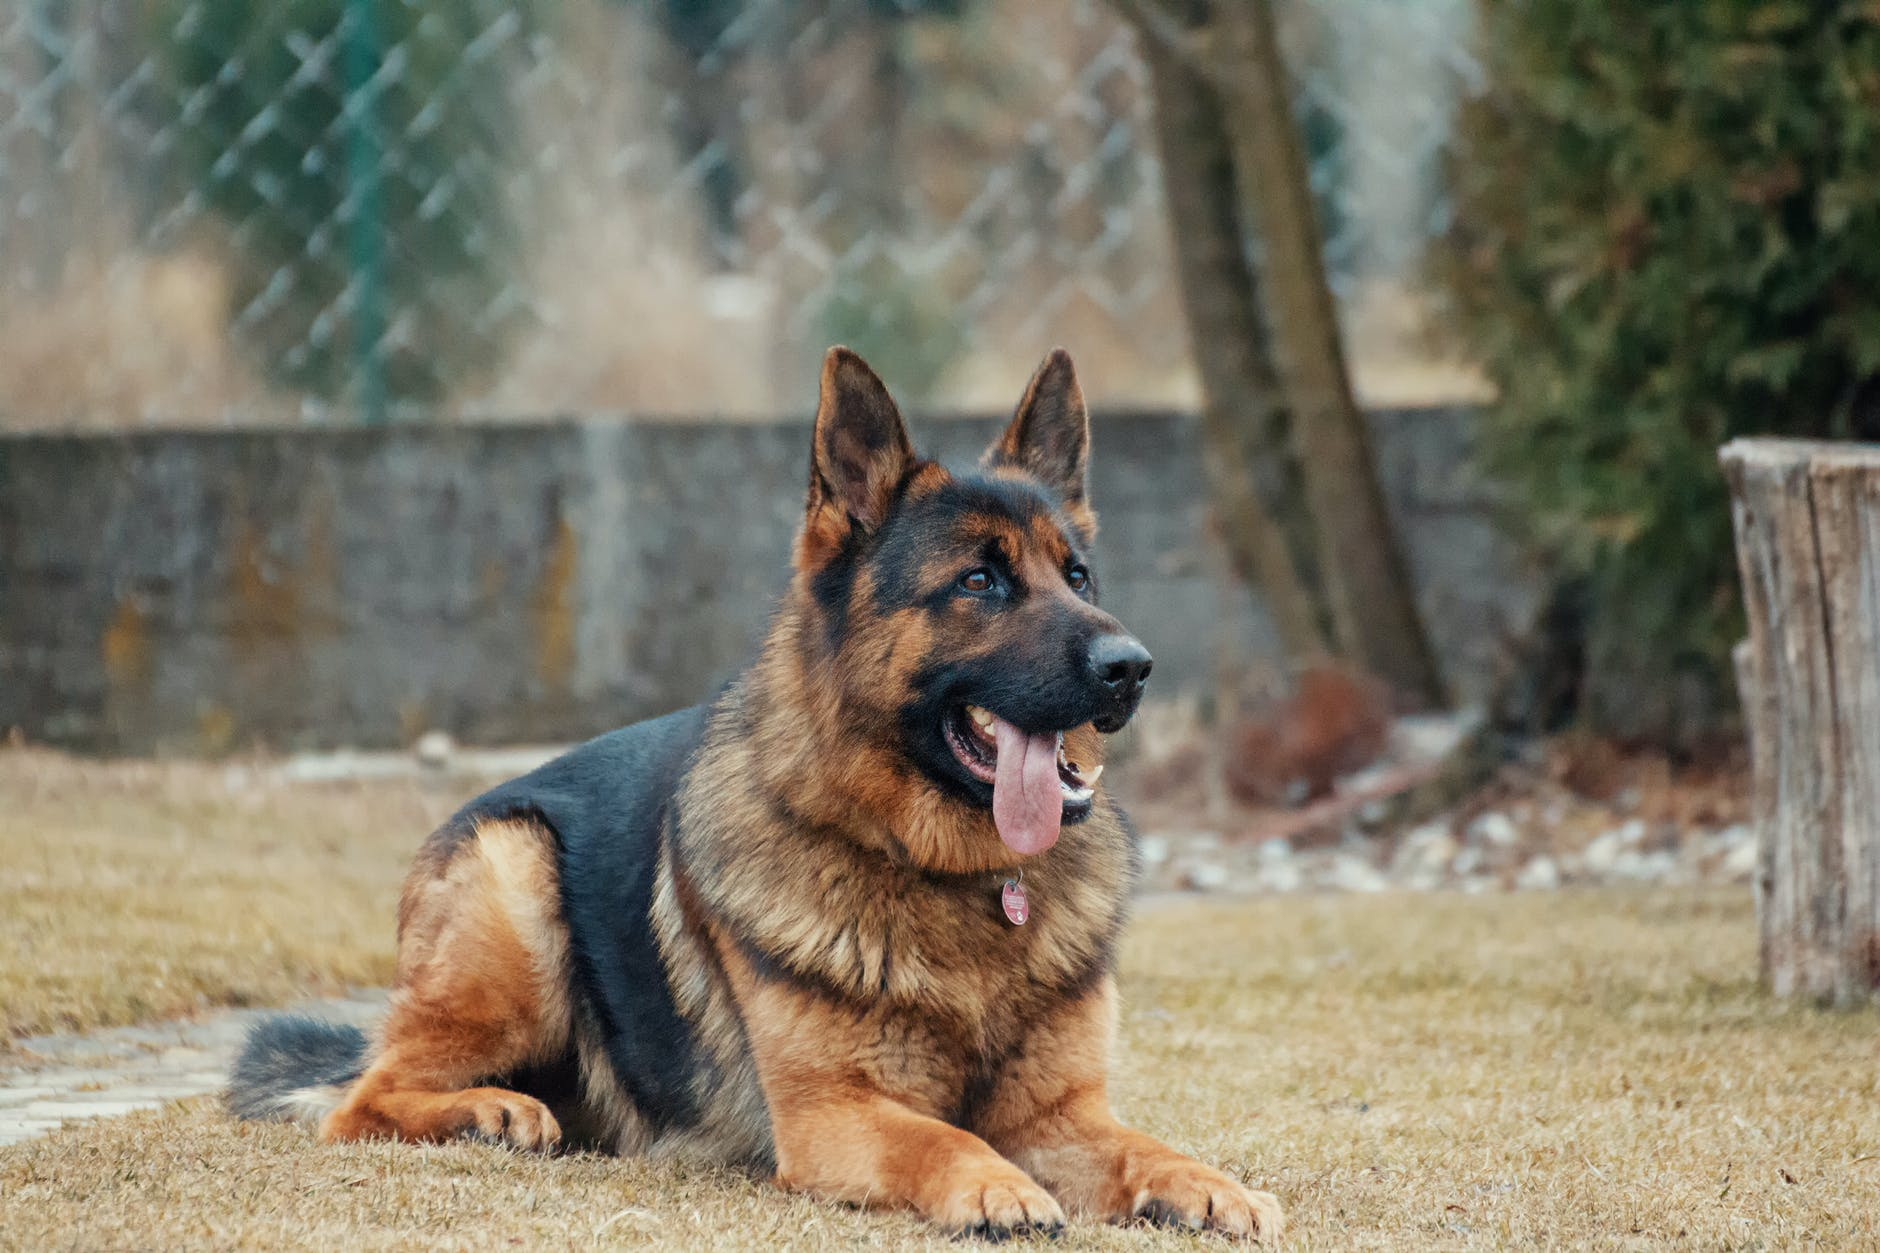 animal animal photography blur breed